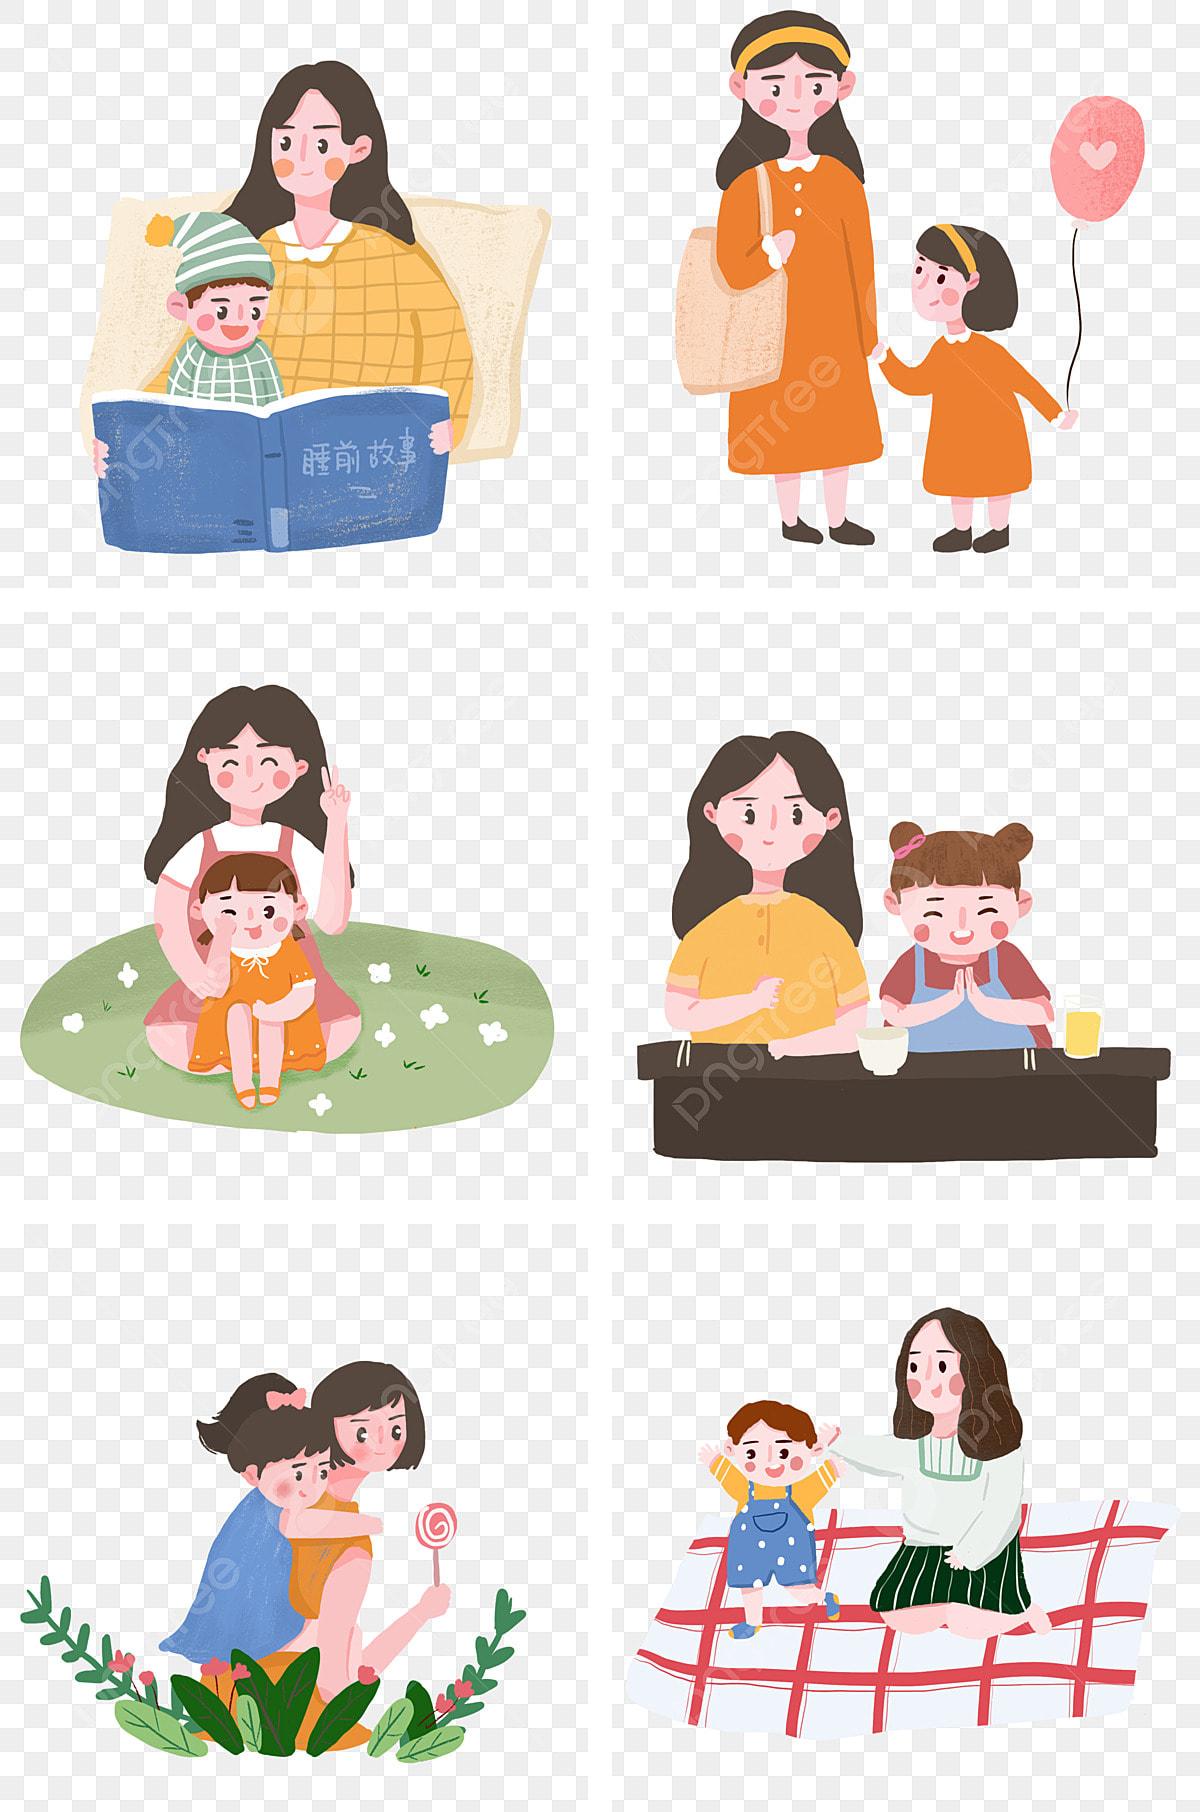 Ilustrasi Ibu Dan Bayi Bergambar Tangan Anak Induk Kuning